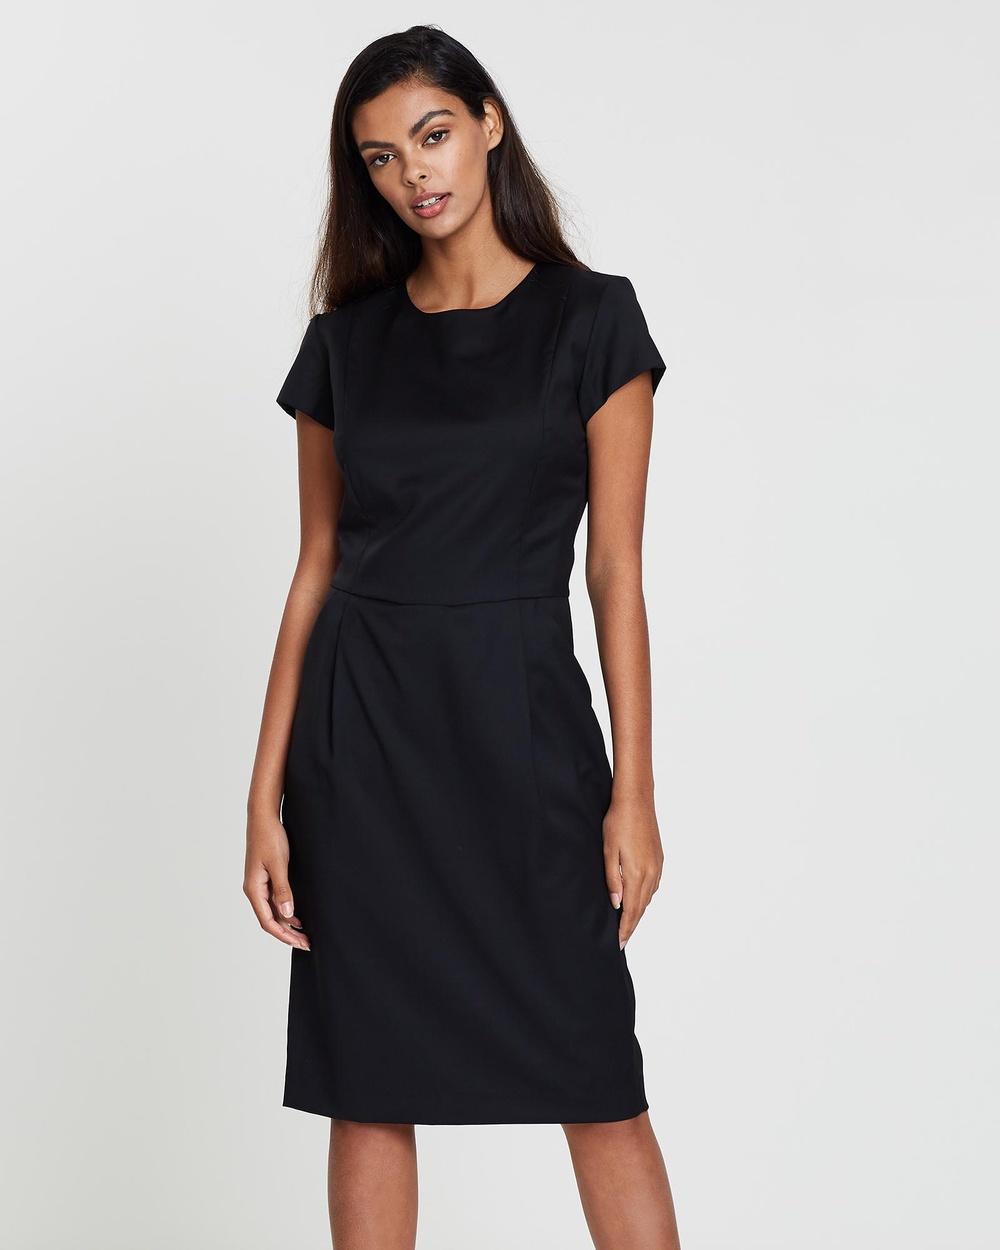 Farage - Core Bianca Dress Dresses (Black)